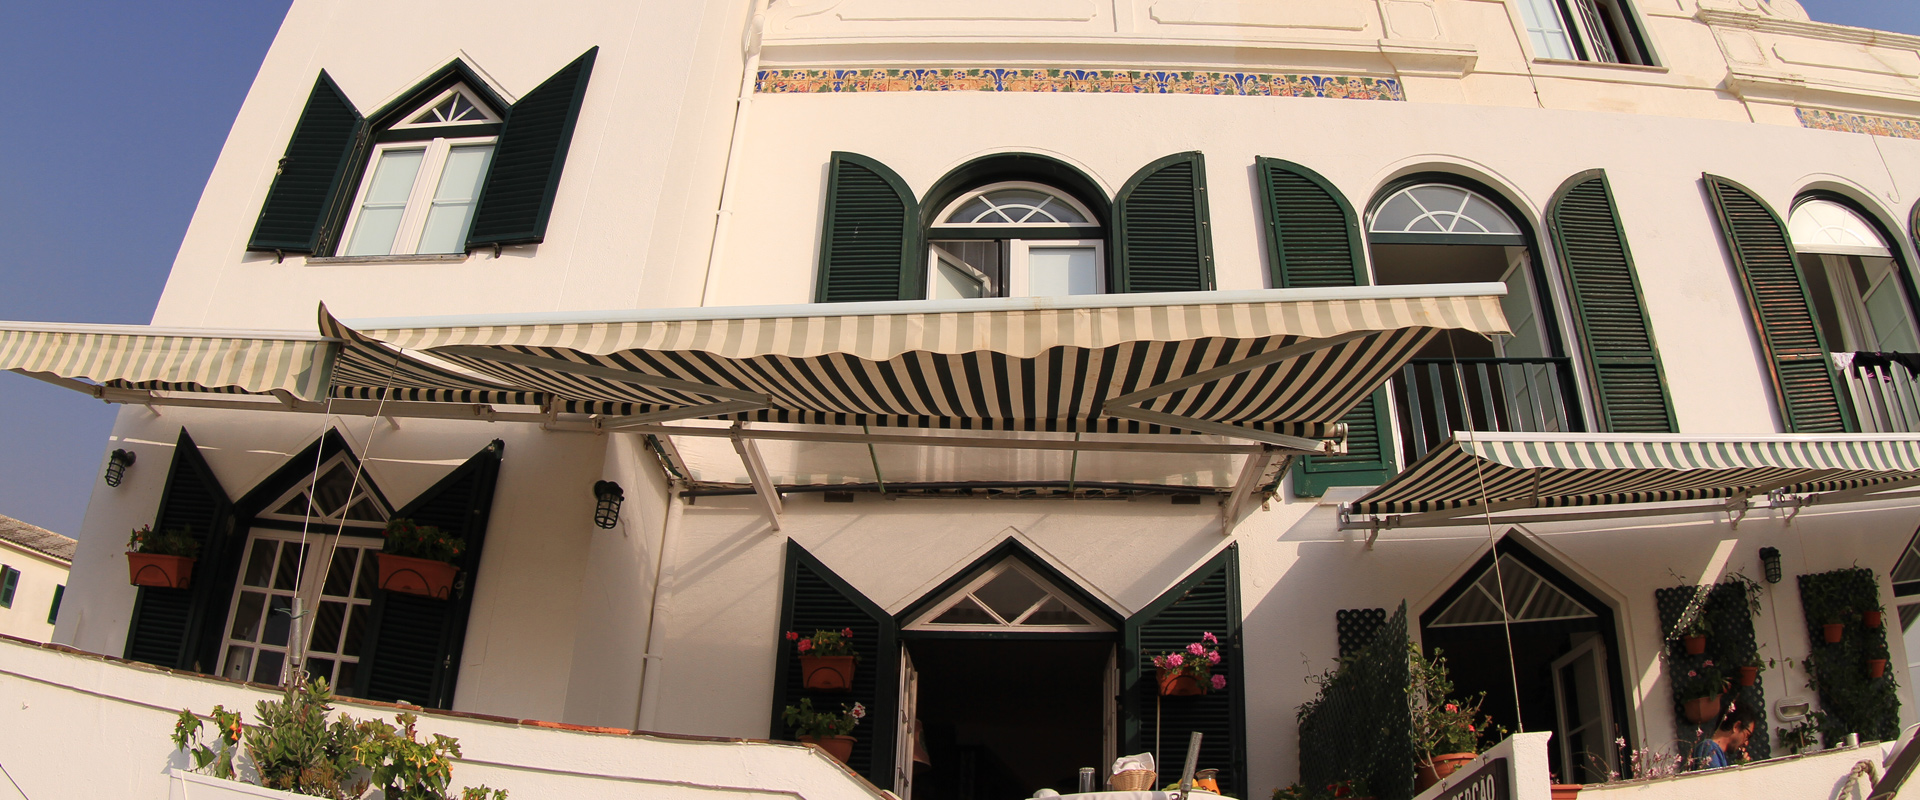 Casa das Marés 3